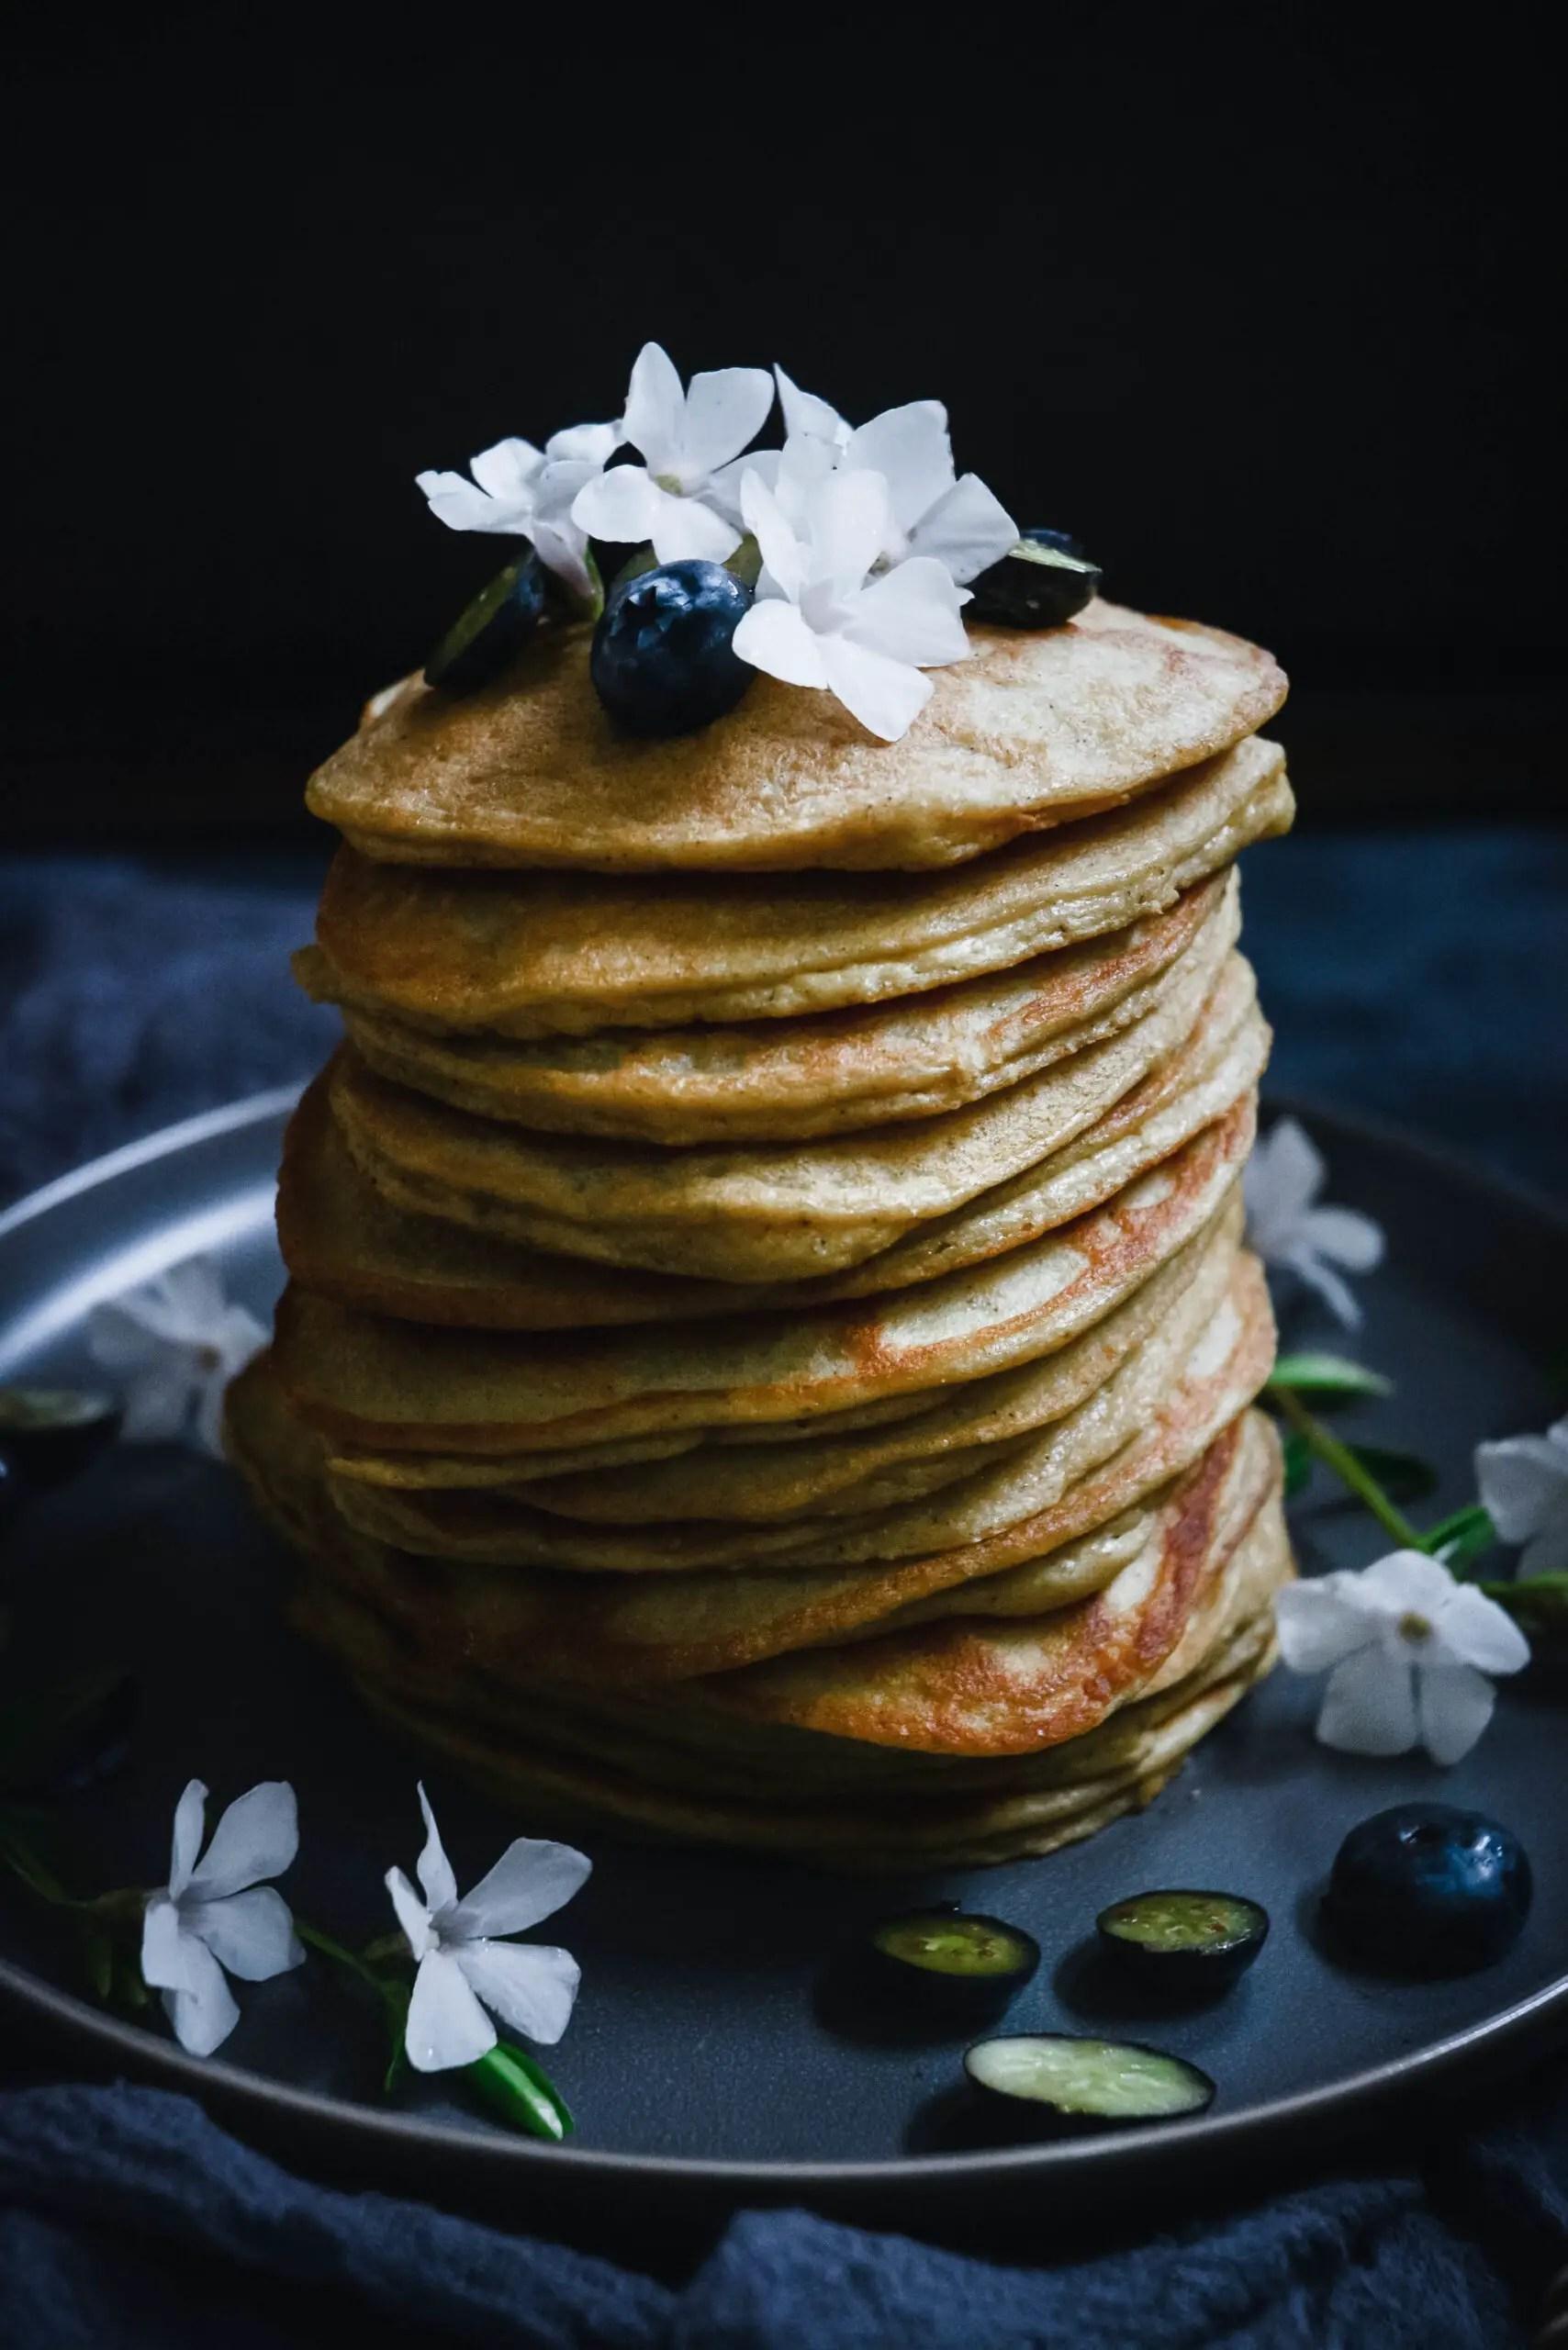 Grain-Free Cardamom Pancakes with Orange Blossom Water